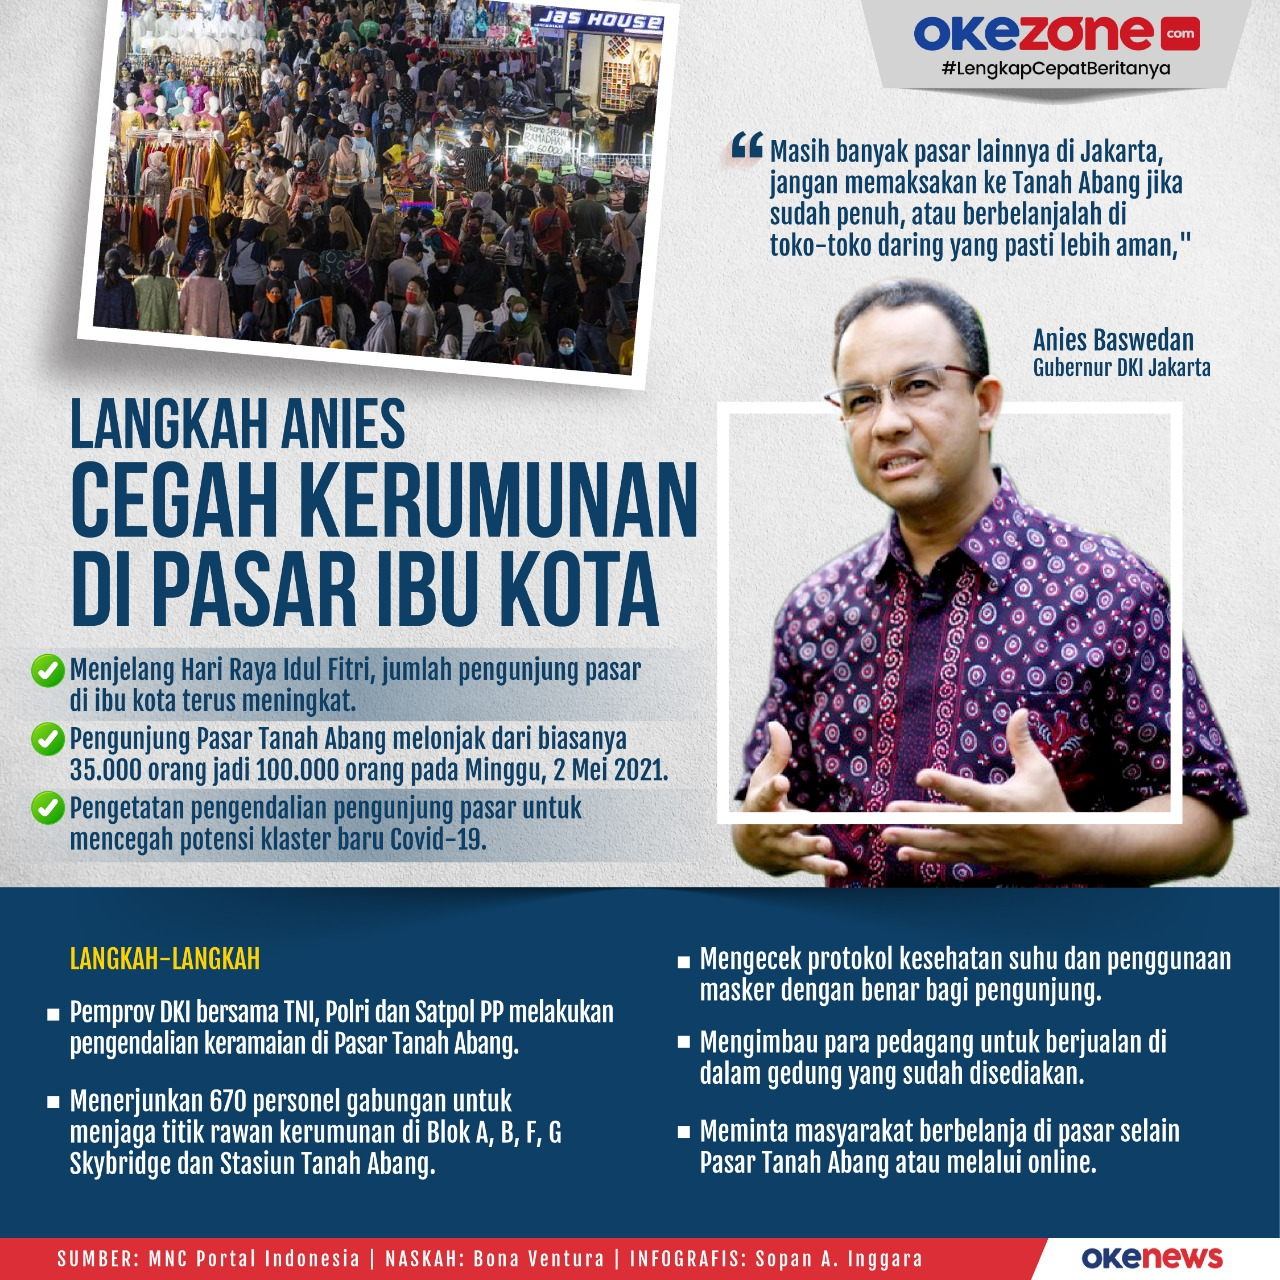 Langkah Anies Cegah Kerumunan di Pasar Ibu Kota -